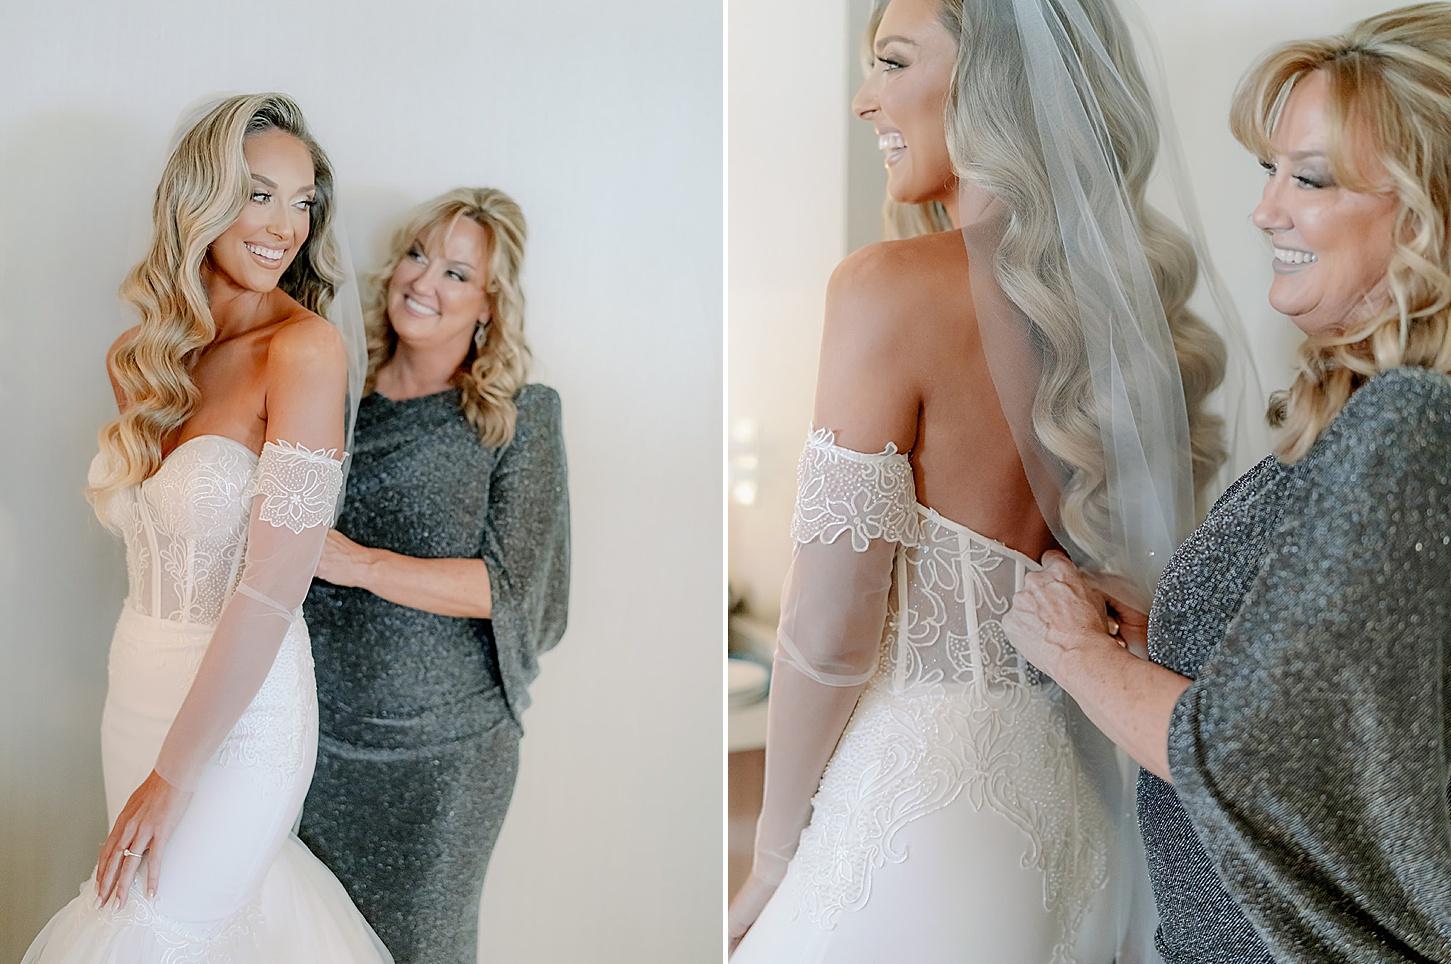 Atlantic City Wedding Photography Studio by Magdalena Studios Lexy Cha 0014